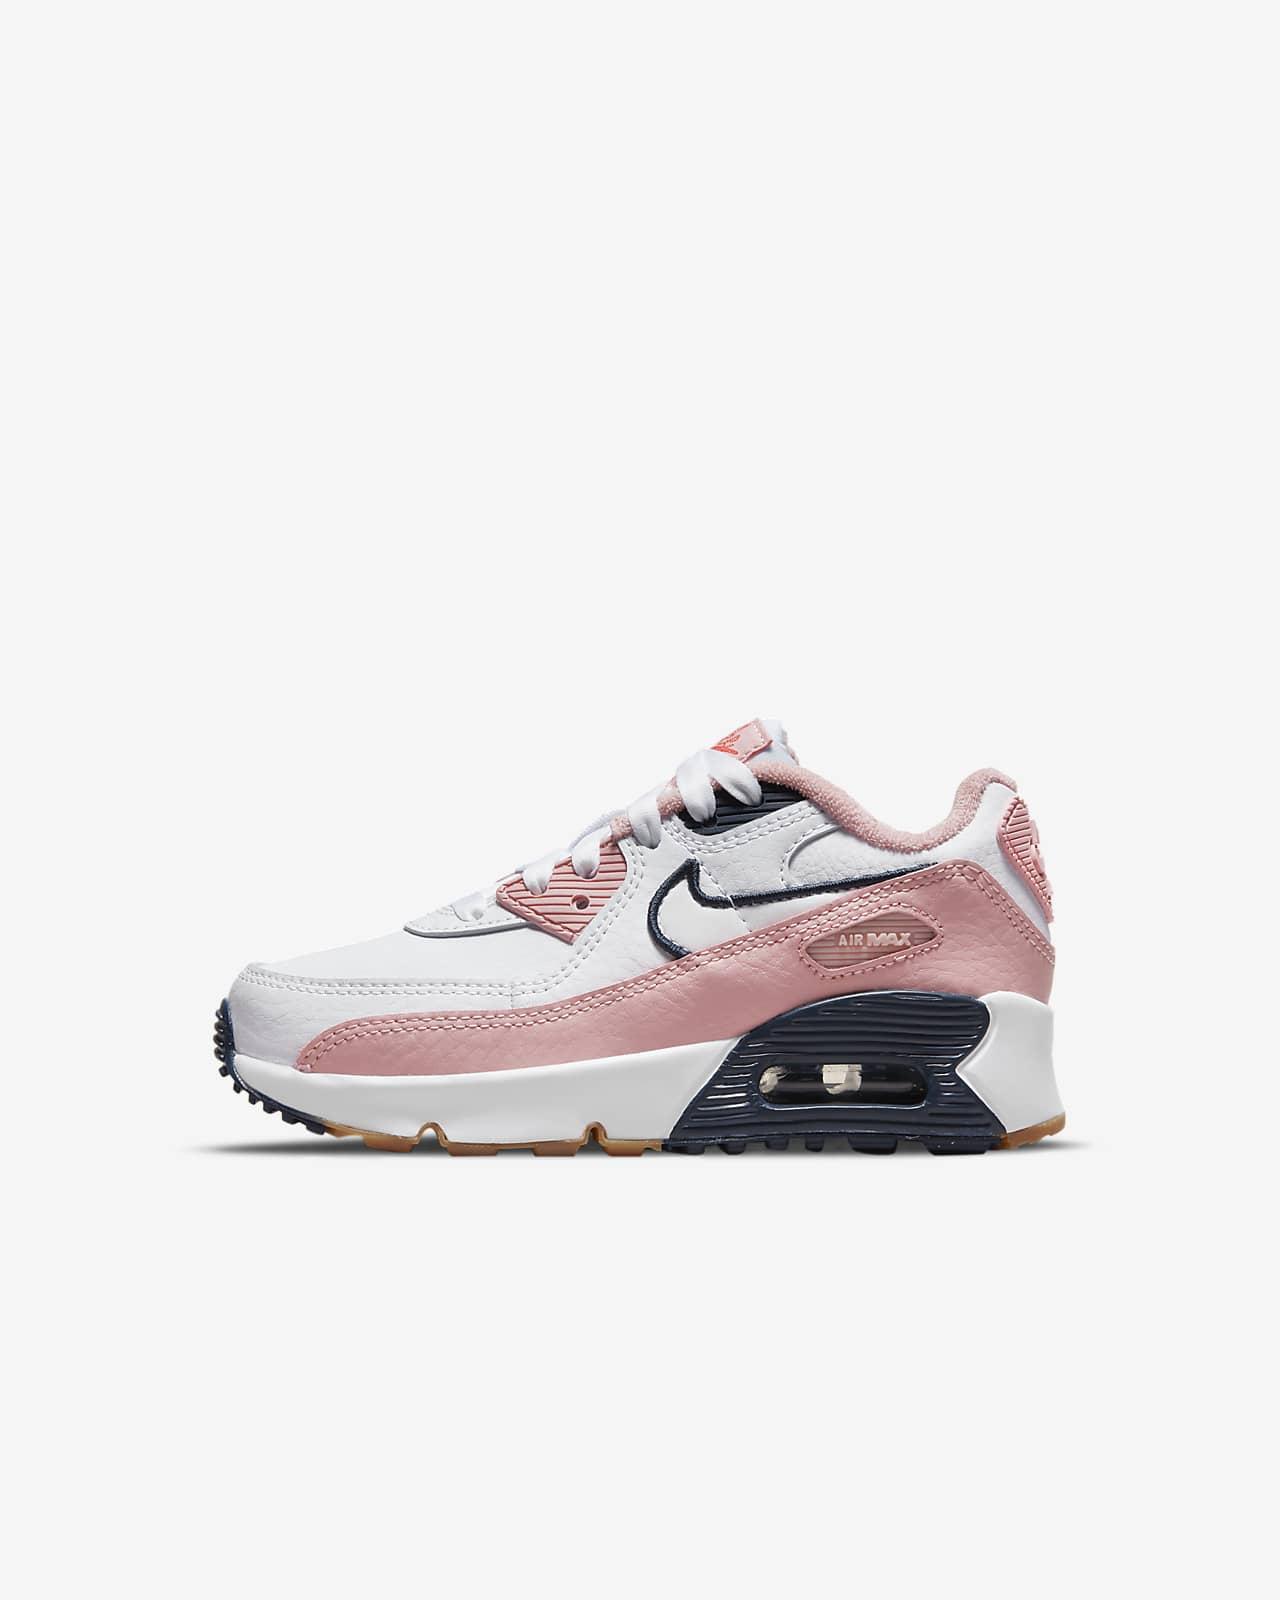 Nike Air Max 90 SE Little Kids' Shoes